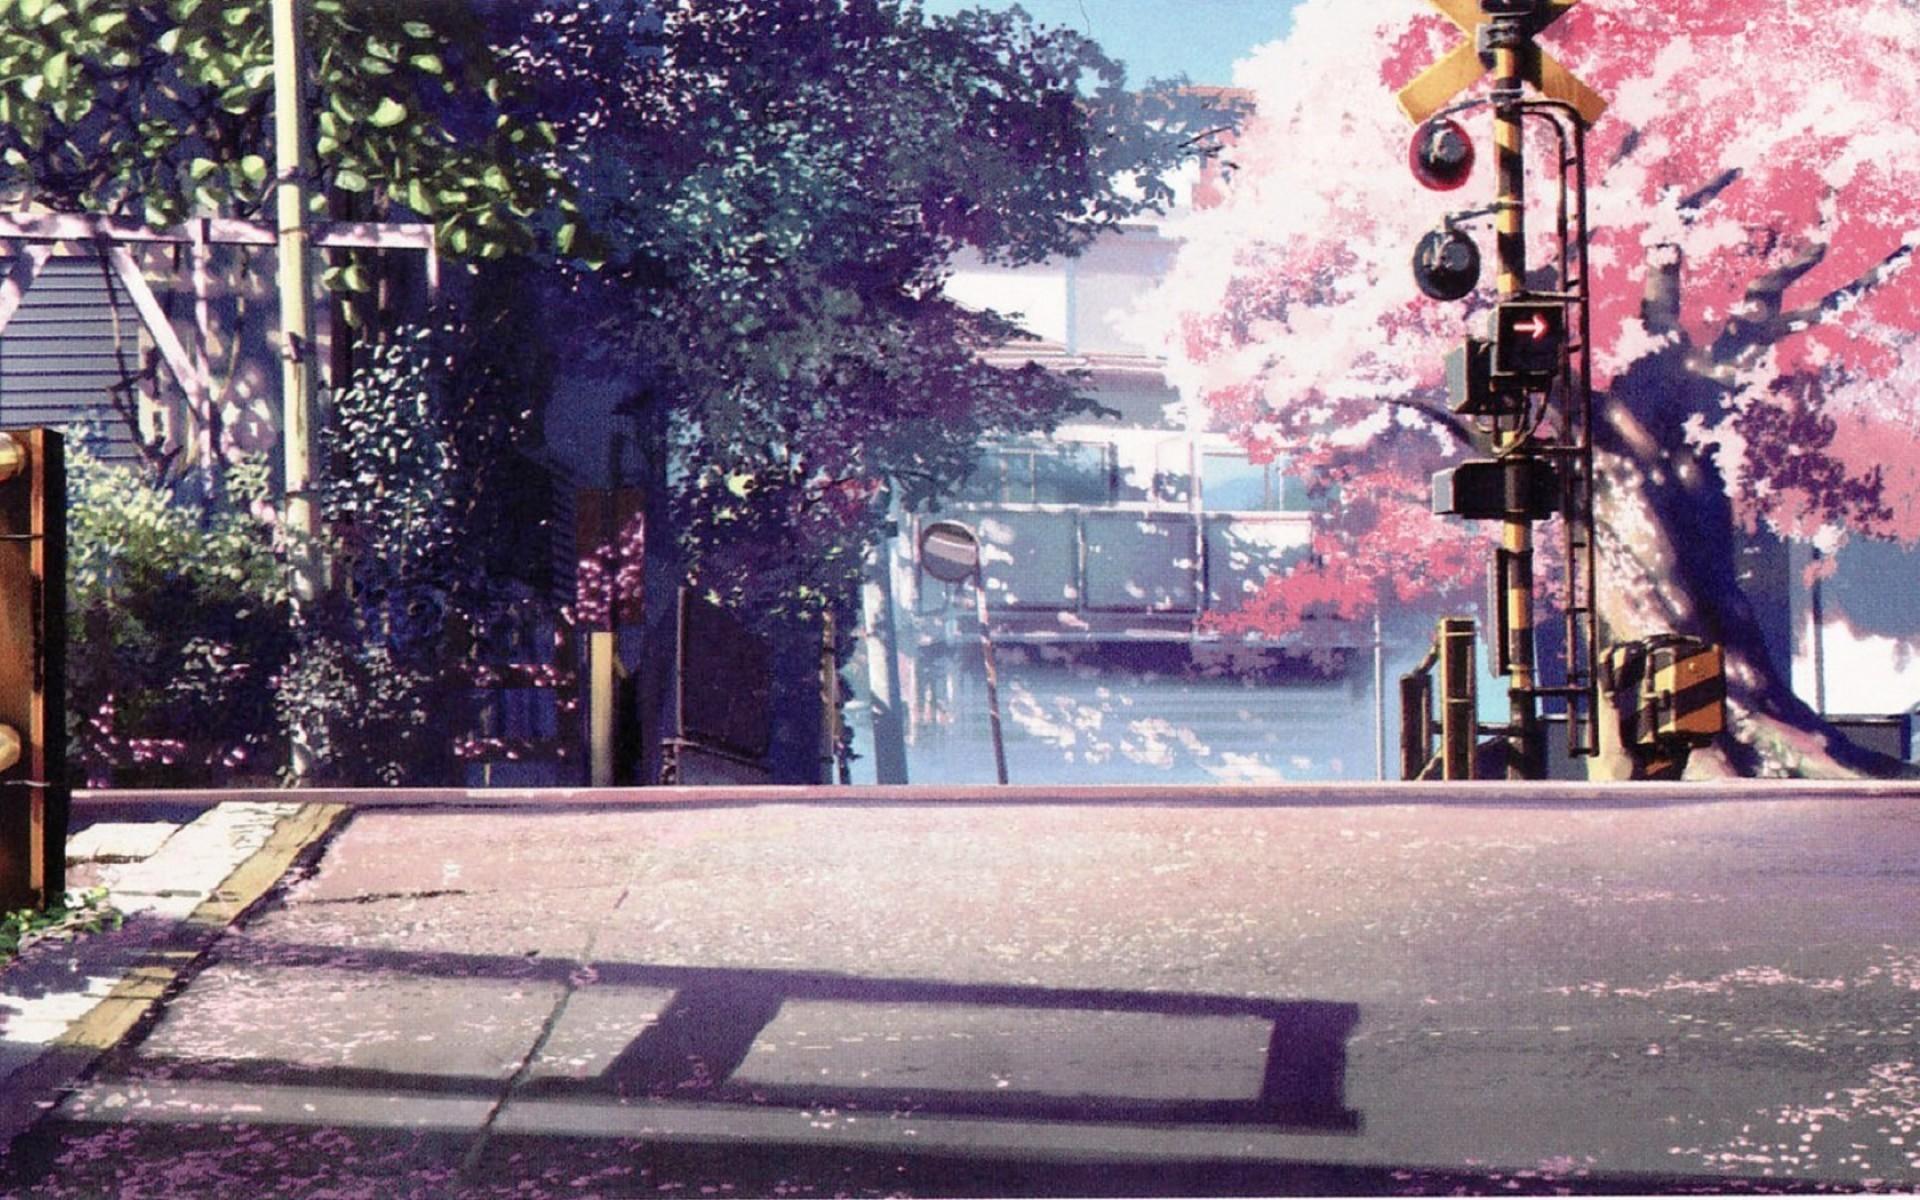 Res: 1920x1200, Anime Cherry Blossom Wallpaper Widescreen.